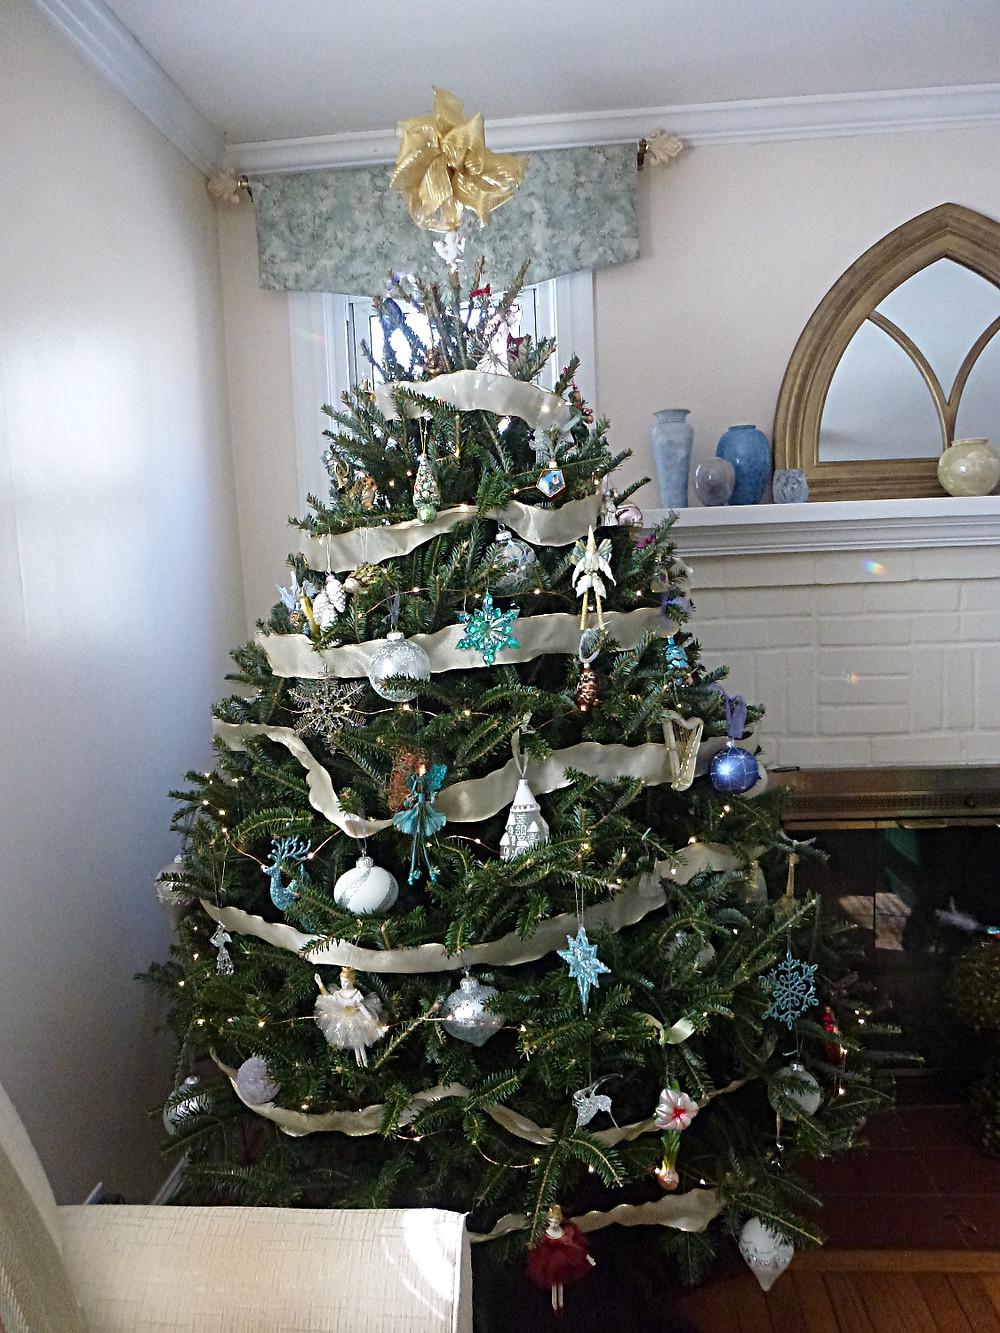 TROSA Christmas Tree Jan. 4, 2018